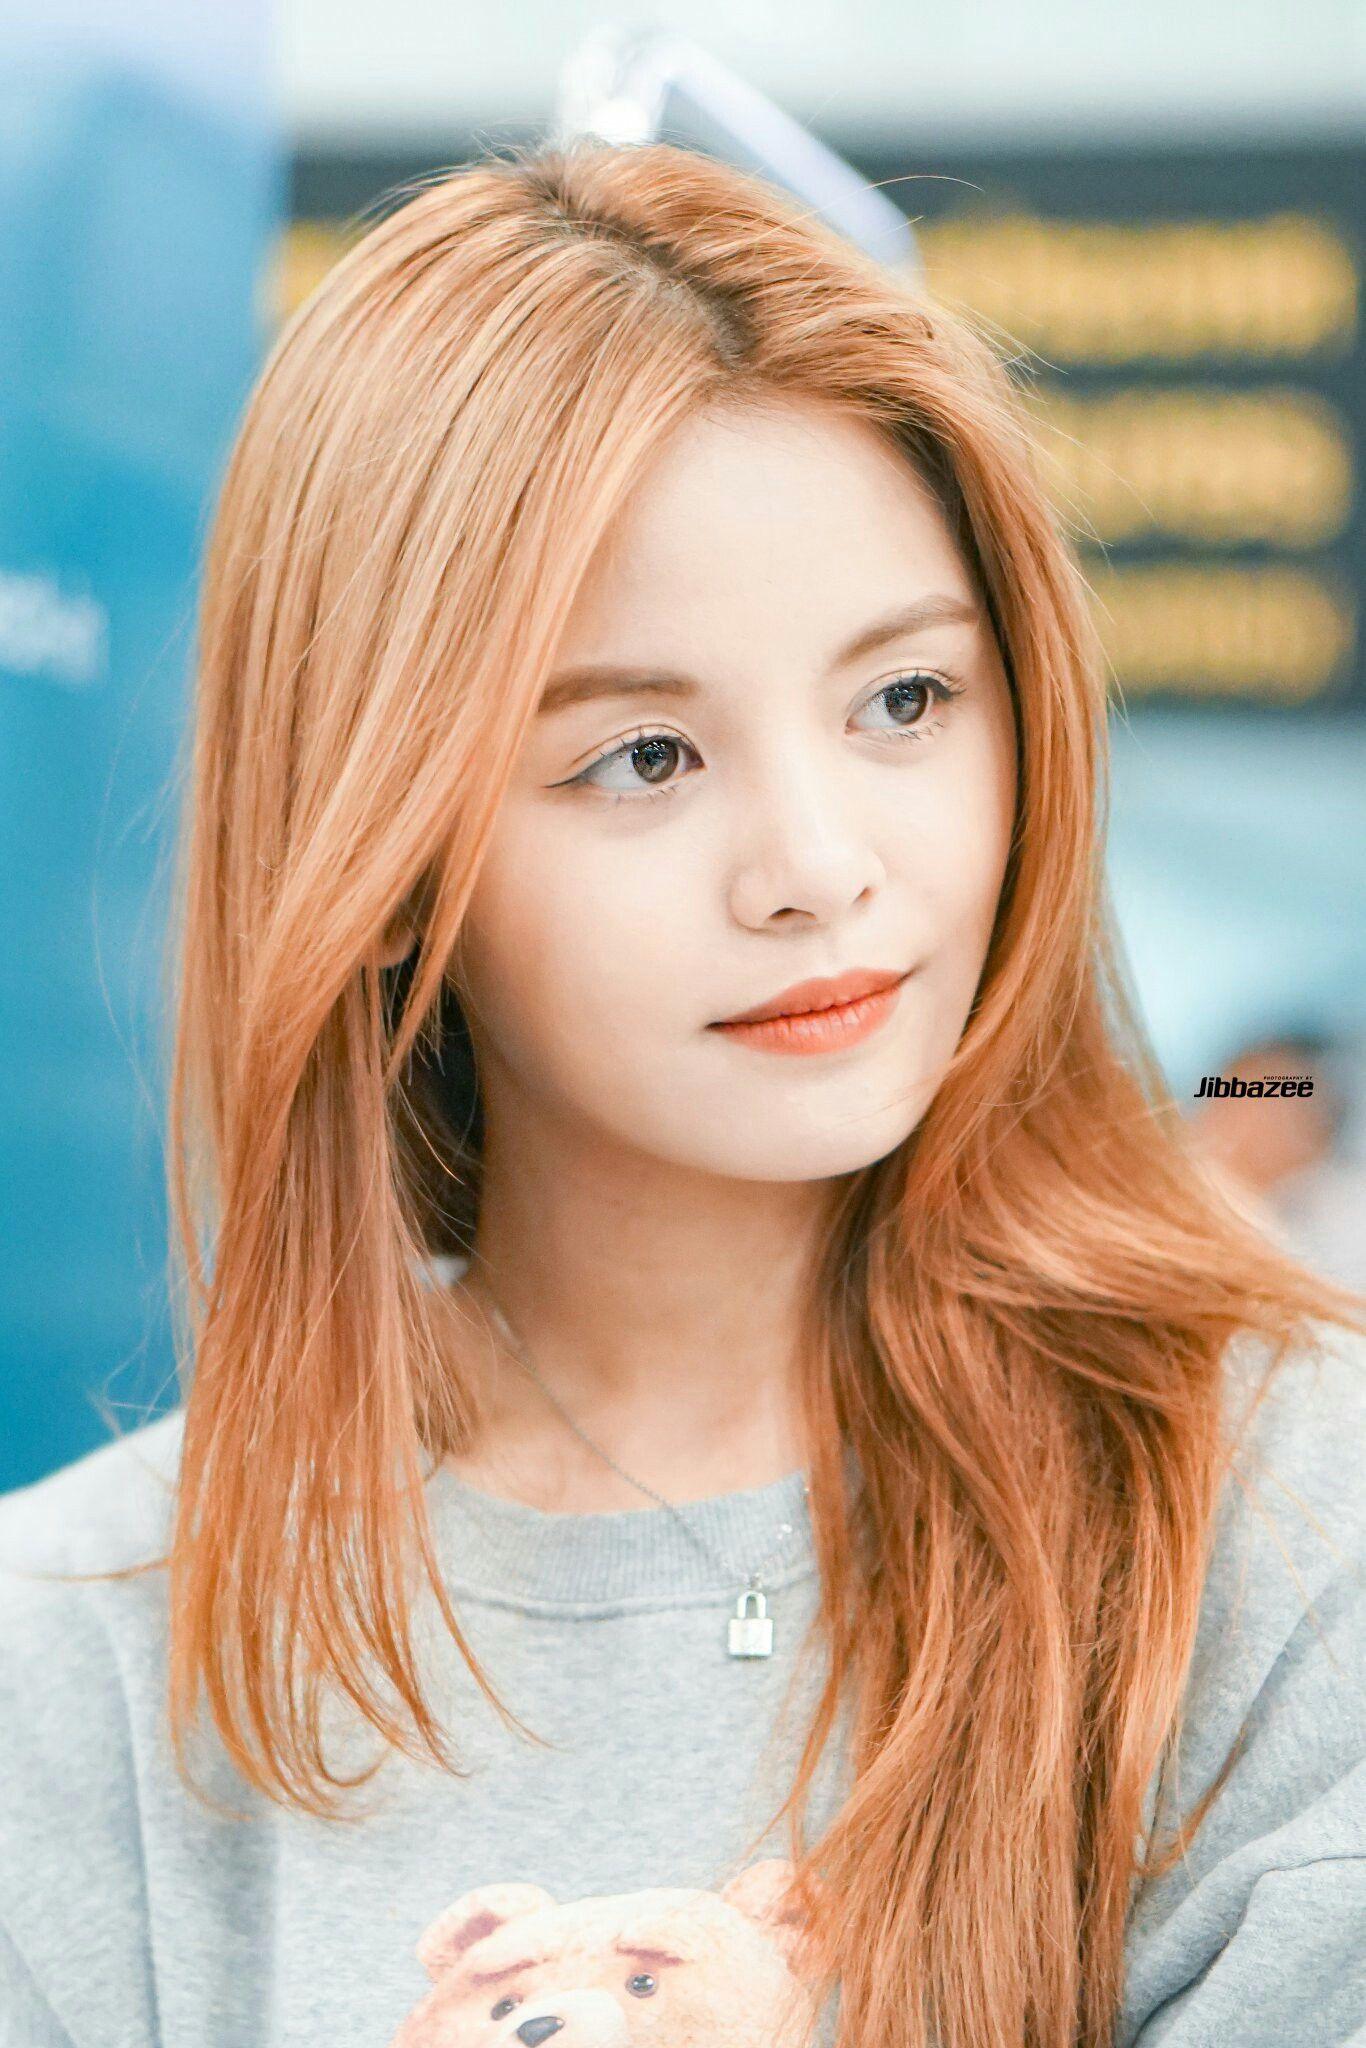 Pin By B On Clc Clc Beauty Kpop Girl Groups